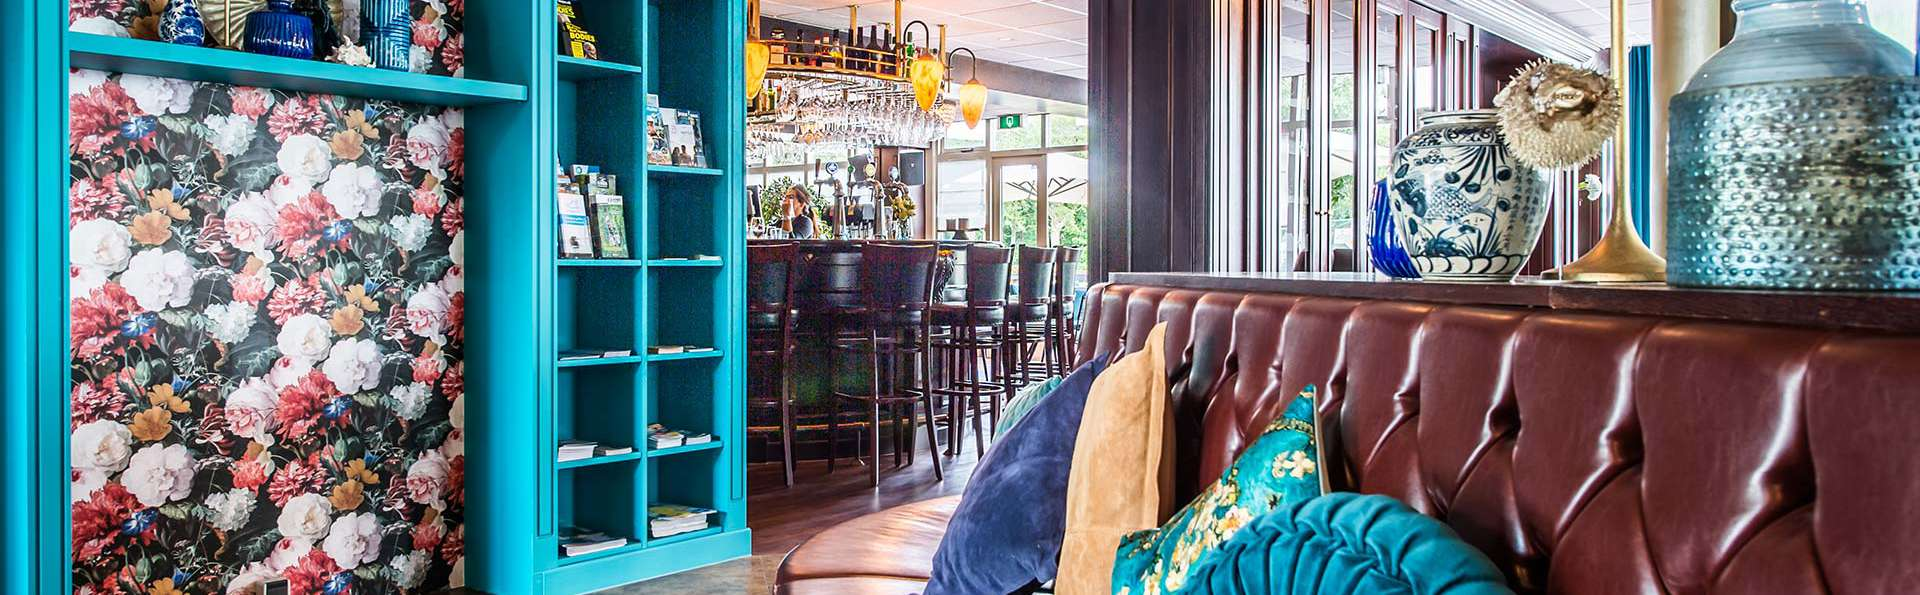 Amadore Hotel Restaurant Arneville - EDIT_N2_HALL_01.jpg